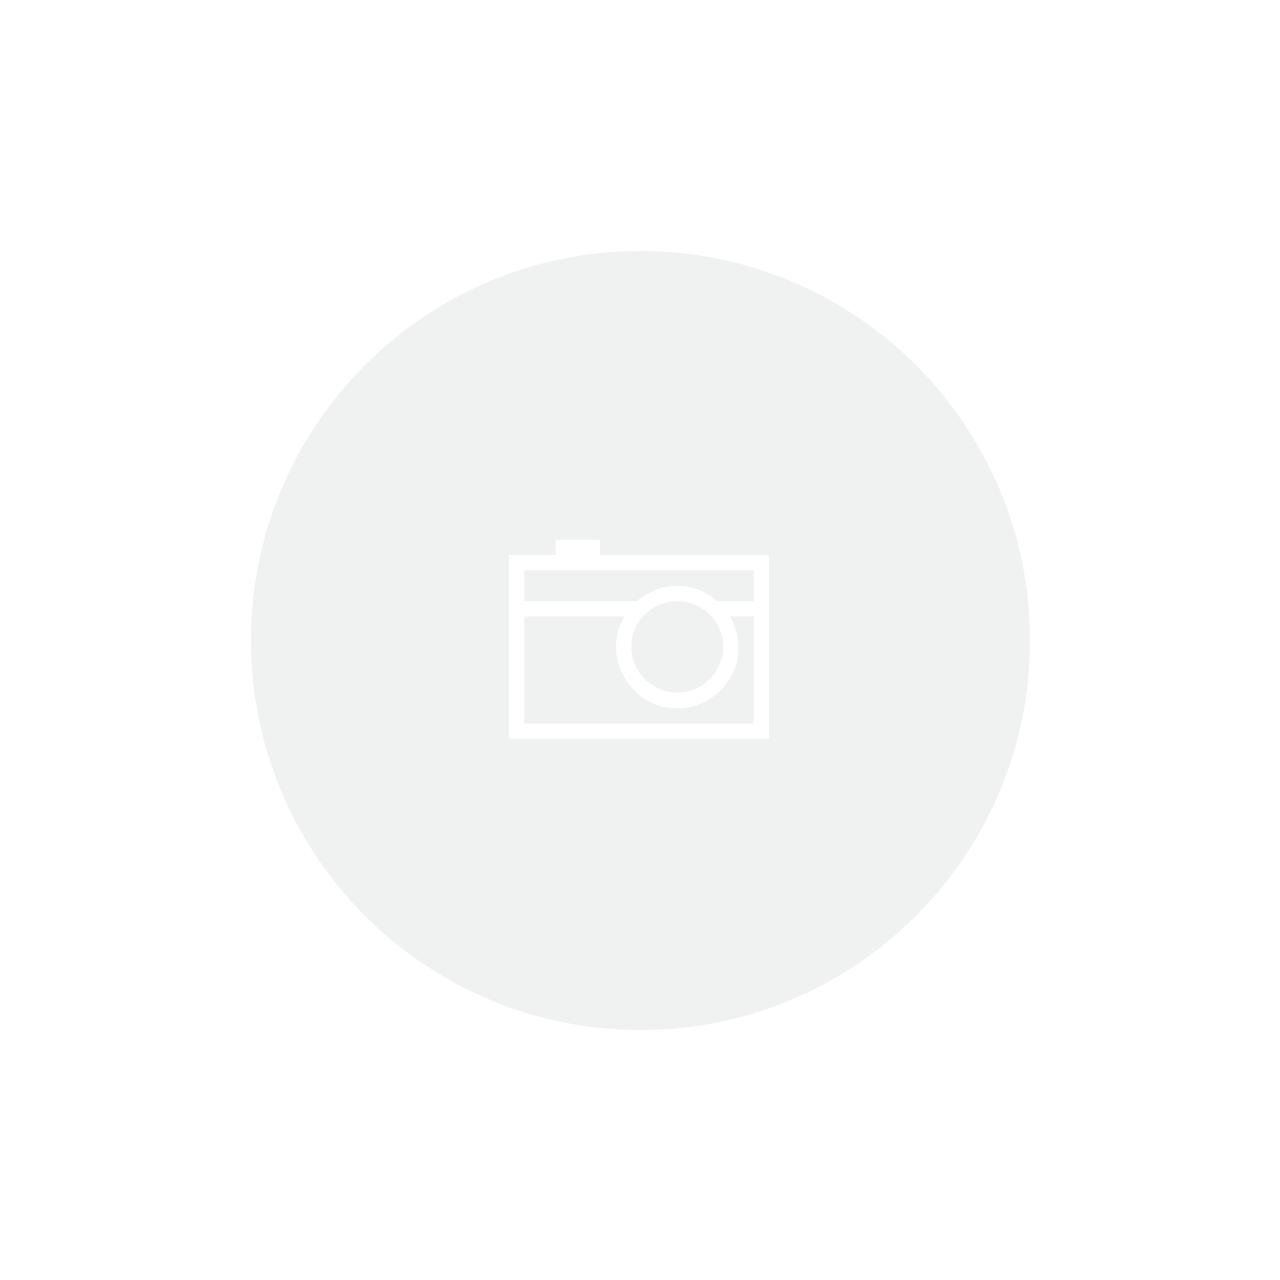 Kit Acessórios de Tosa Profissional - Propetz 04 Itens